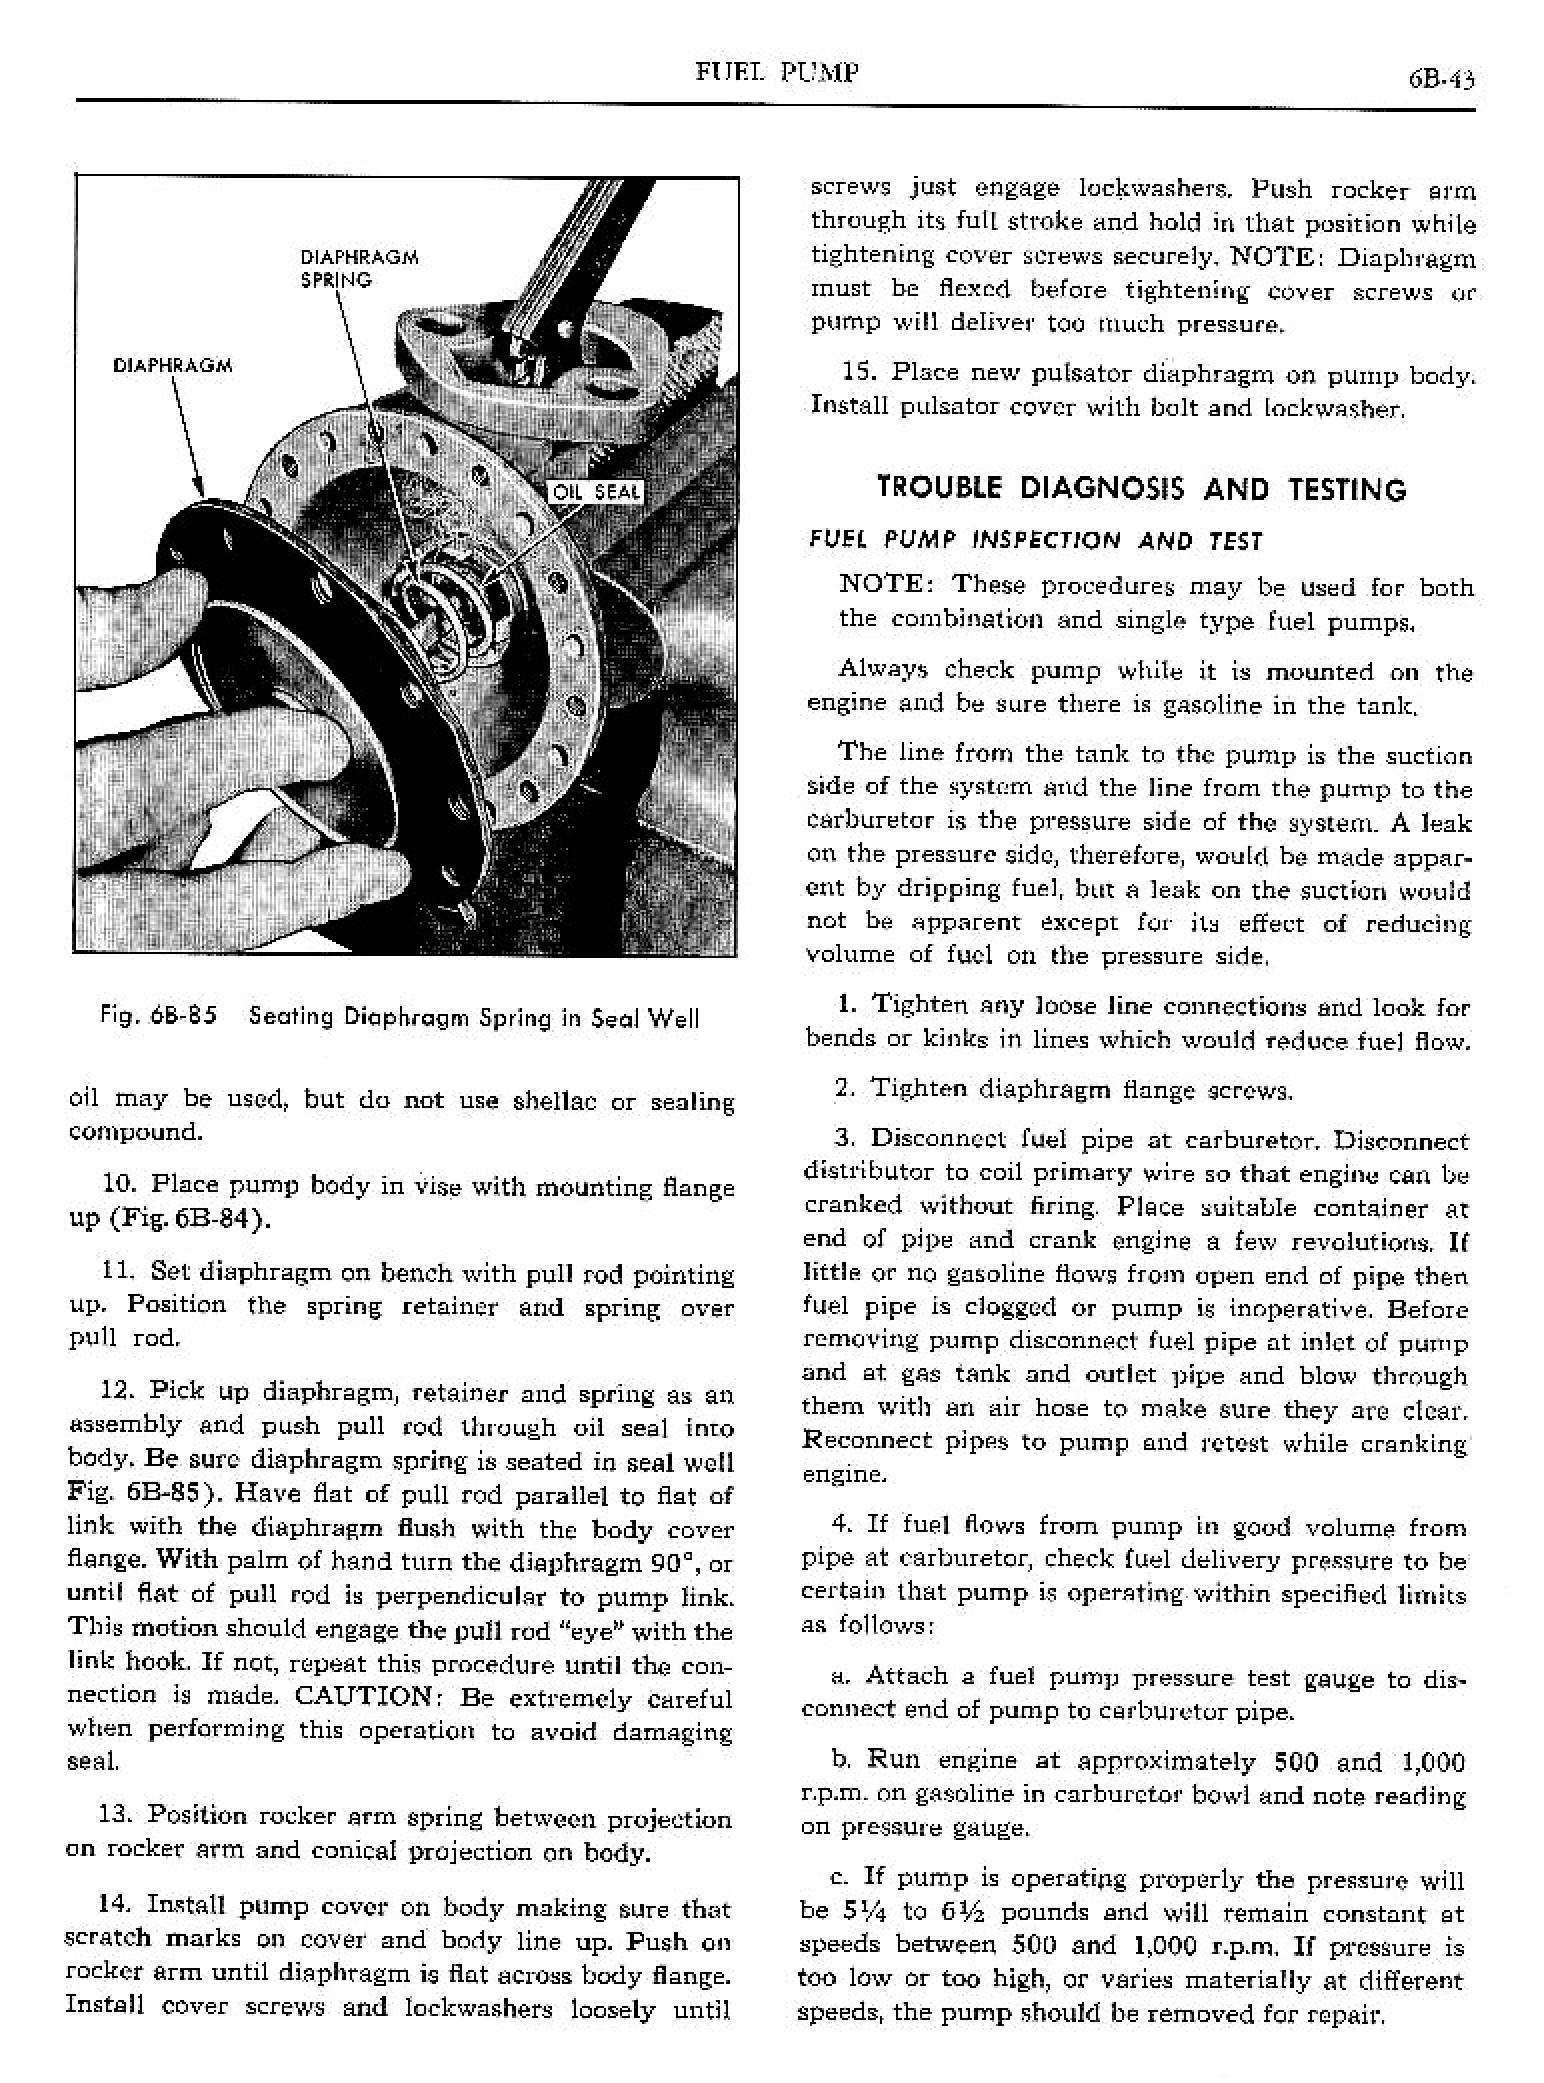 1960 Pontiac Shop Manual- Engine Fuel Page 46 of 46